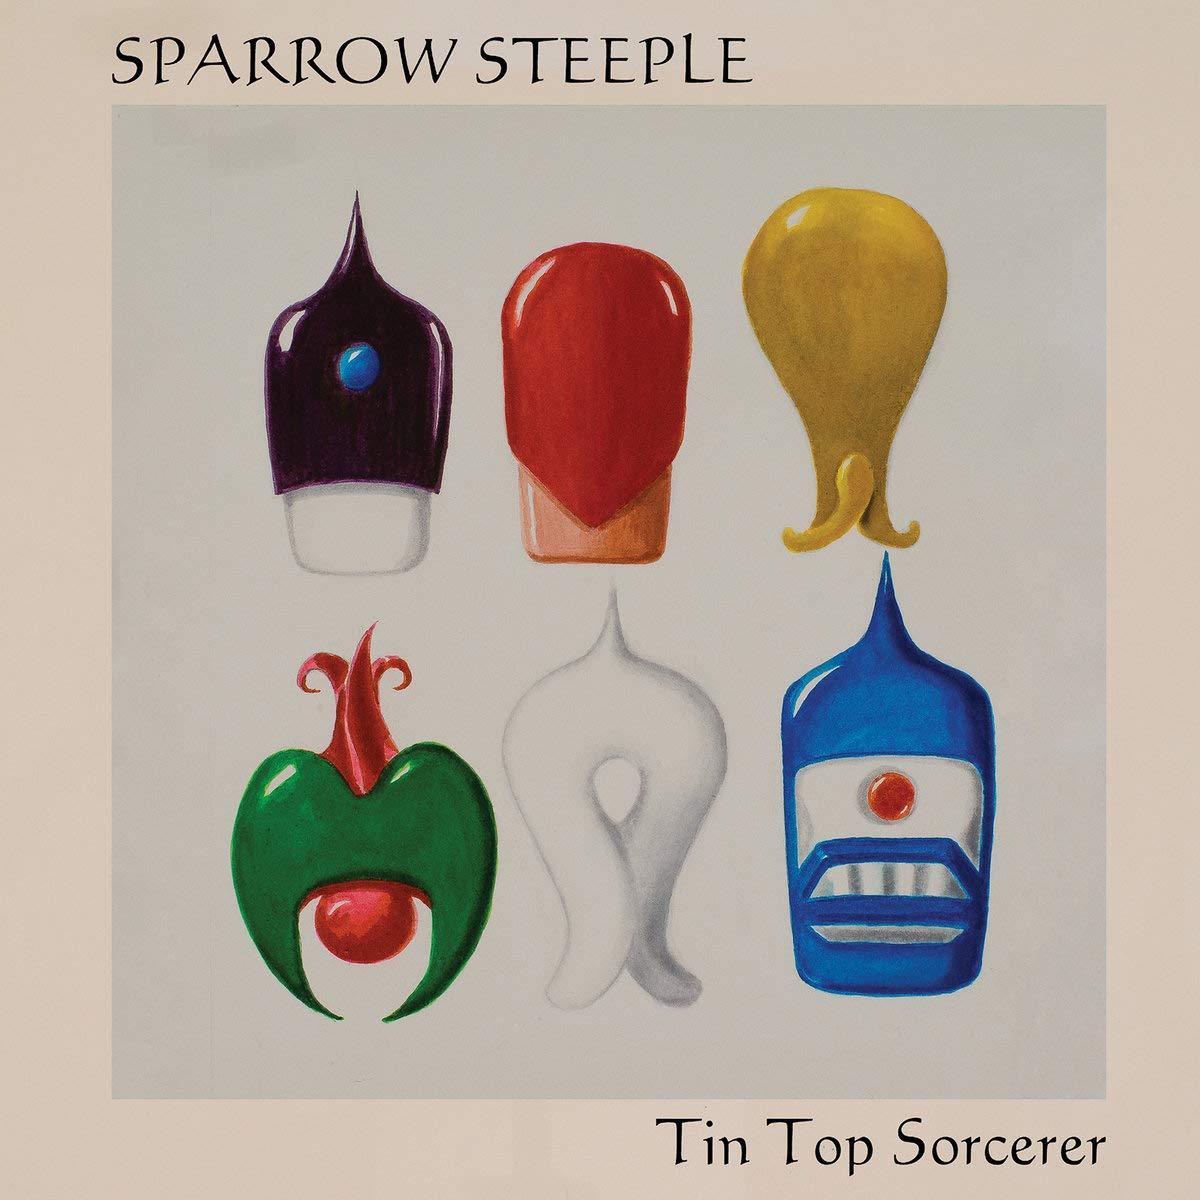 Vinilo : Sparrow Steeple - Tin Top Sorcerer (LP Vinyl)